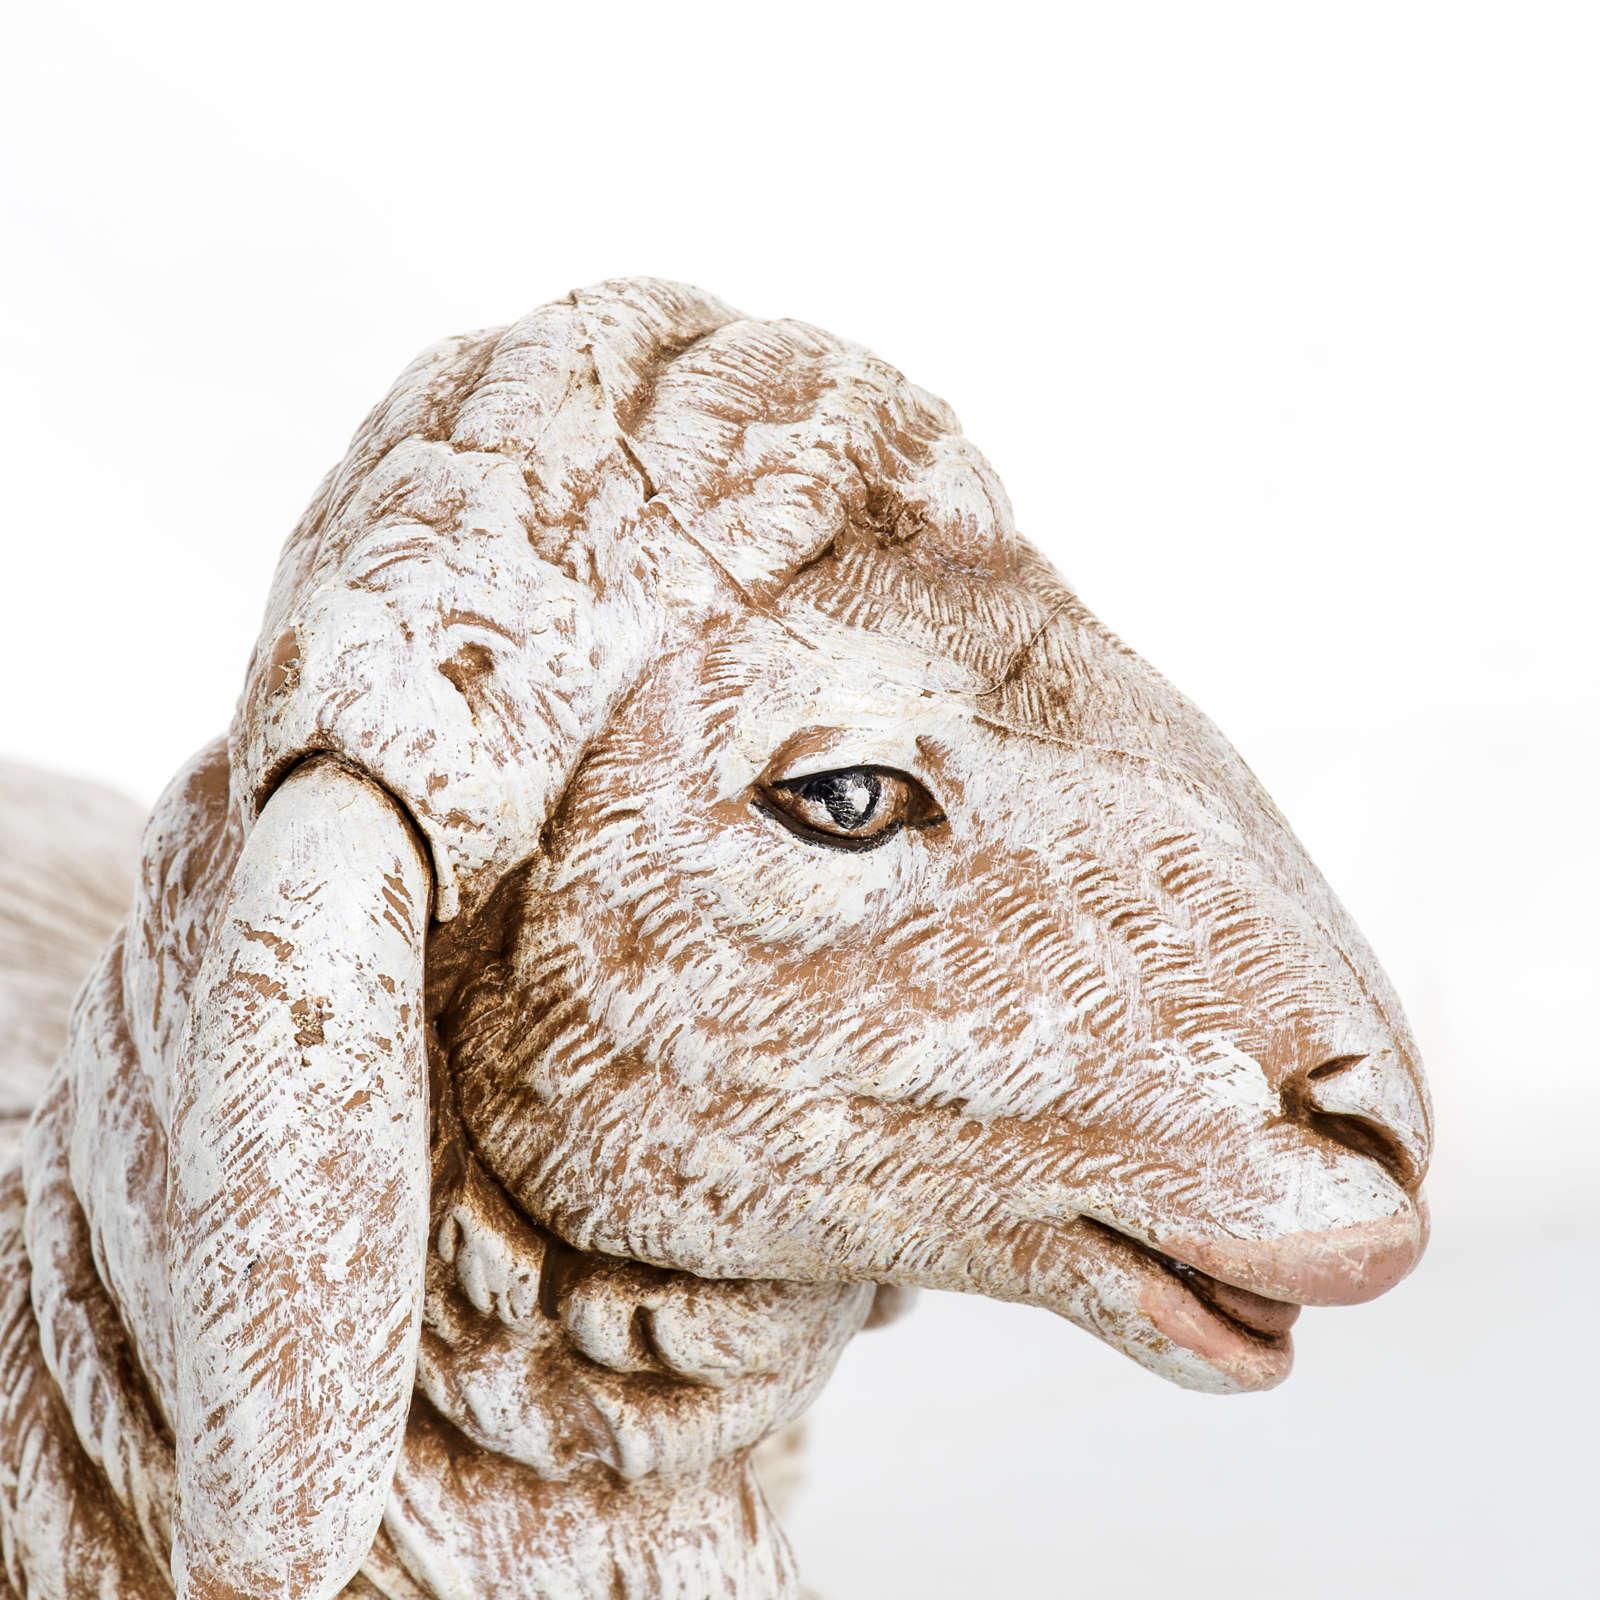 Owca leżąca Fontanini 65 cm żywica 4